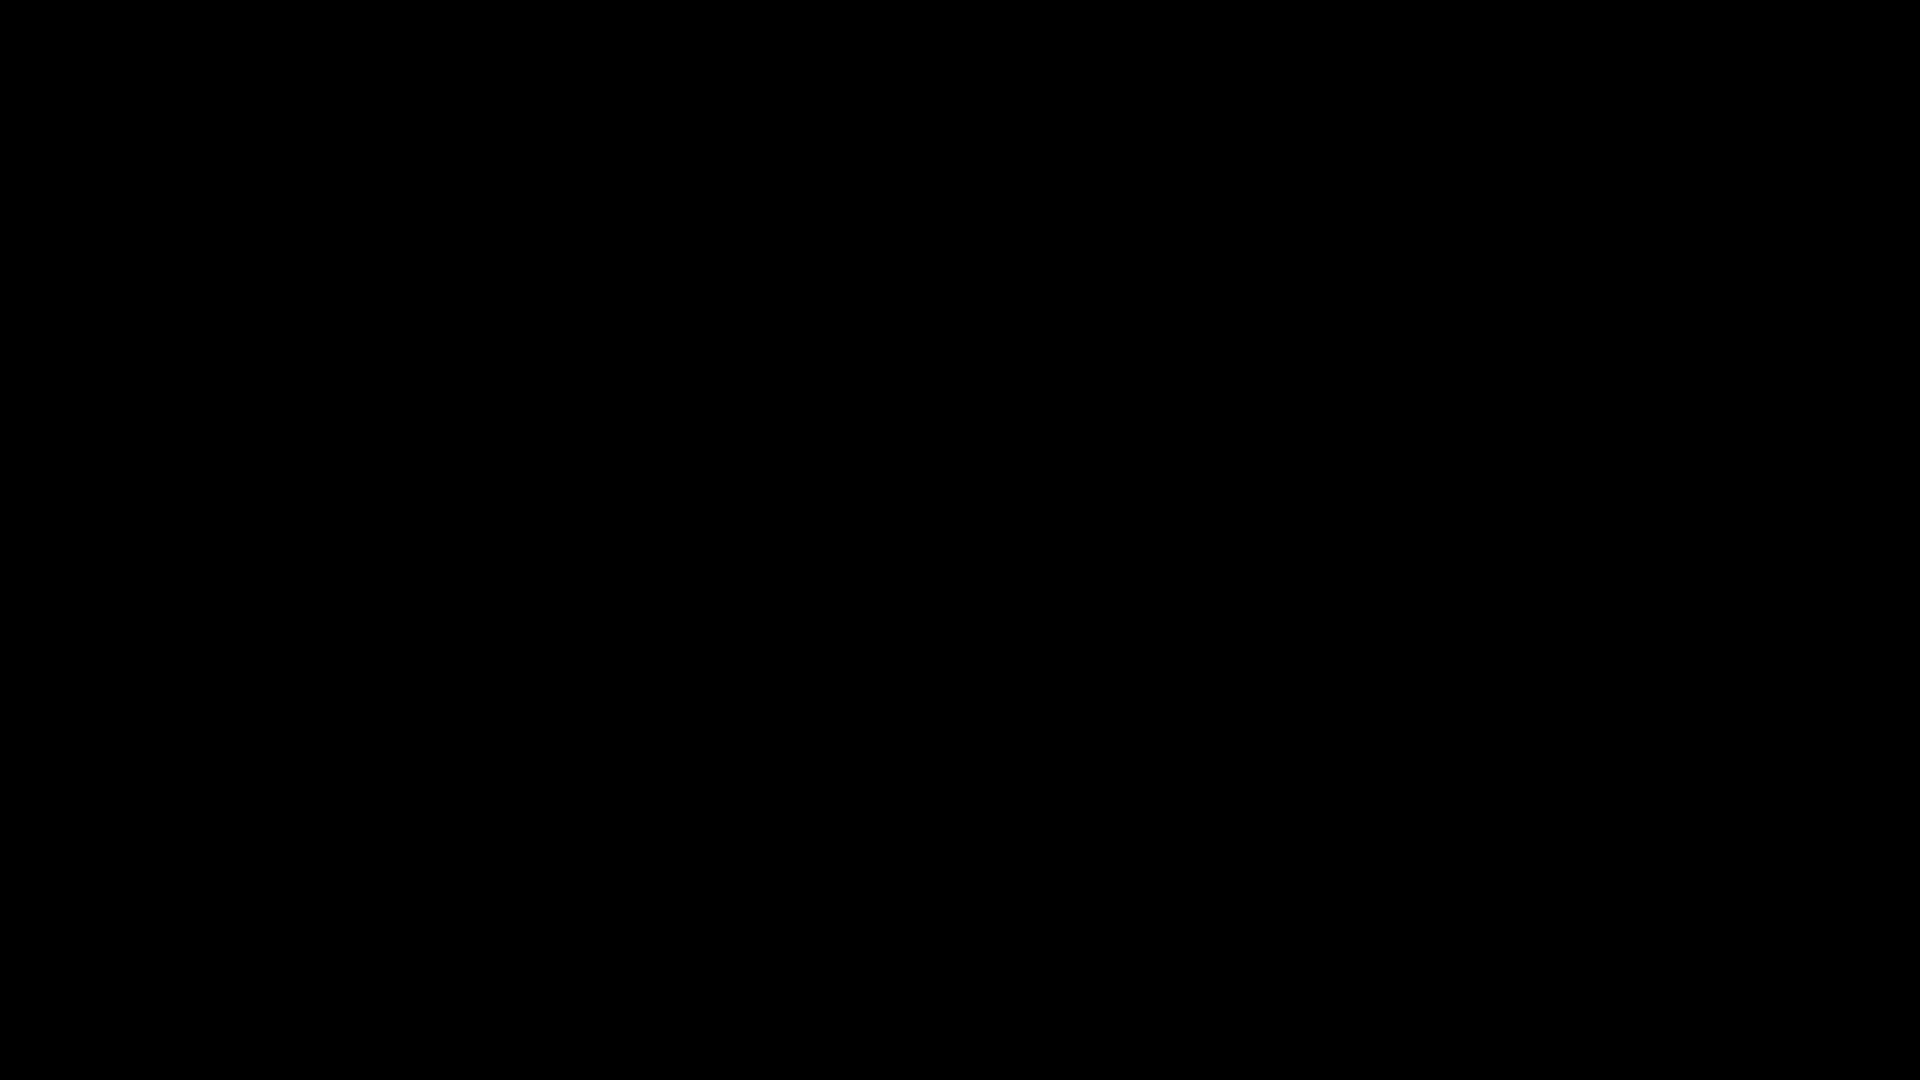 WITSON ANDROID 9,1 para CITROEN C4 de DVD del coche de la pantalla táctil